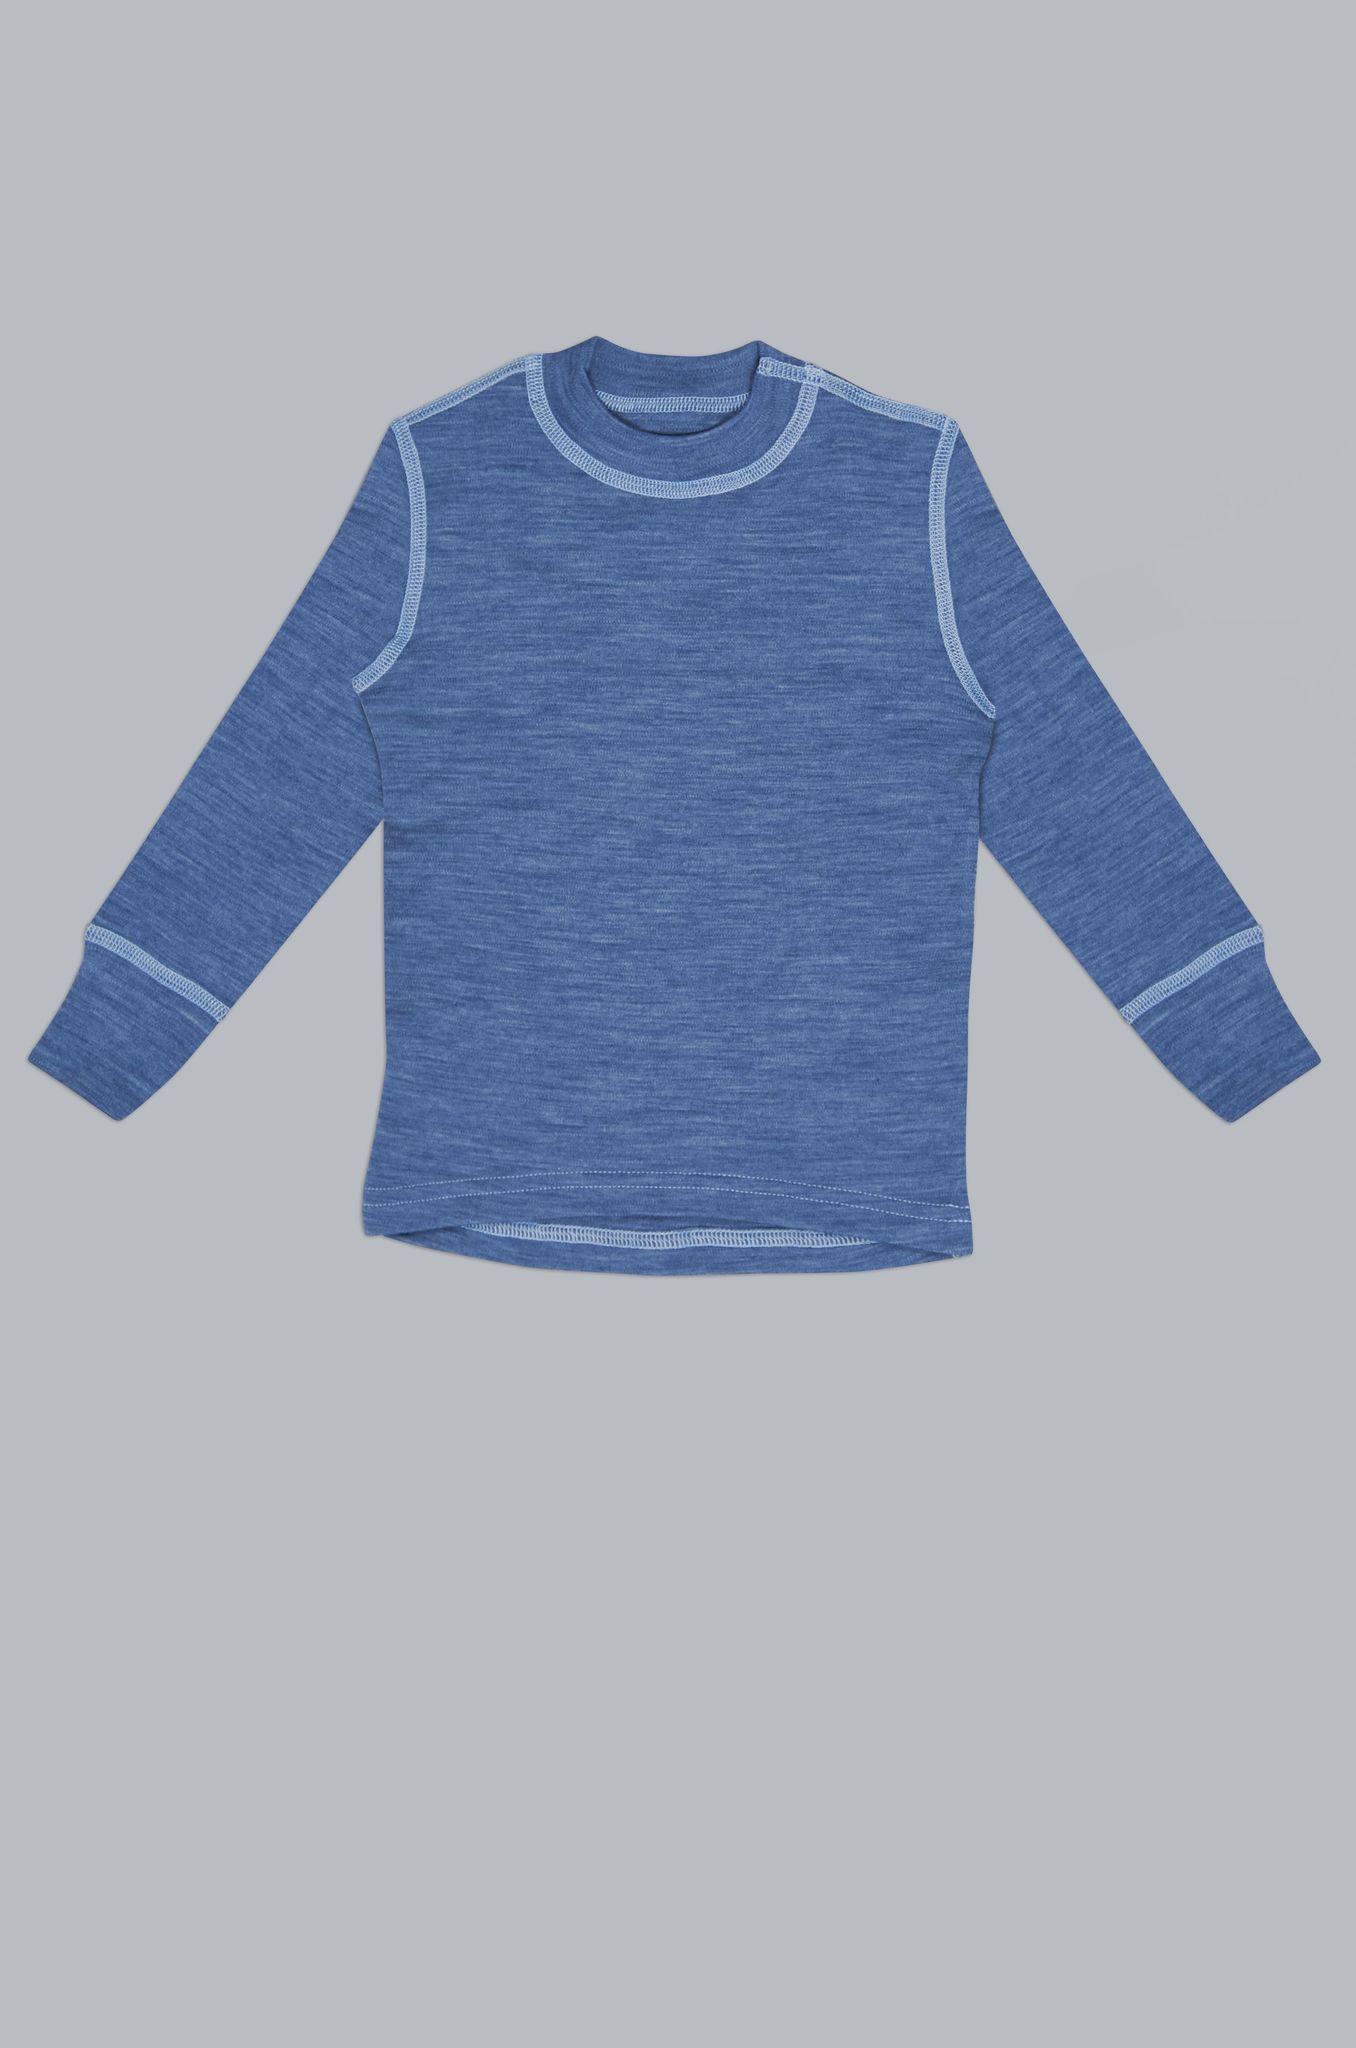 Футболка с длин.рукавом, синий деним 128/134 Choupette